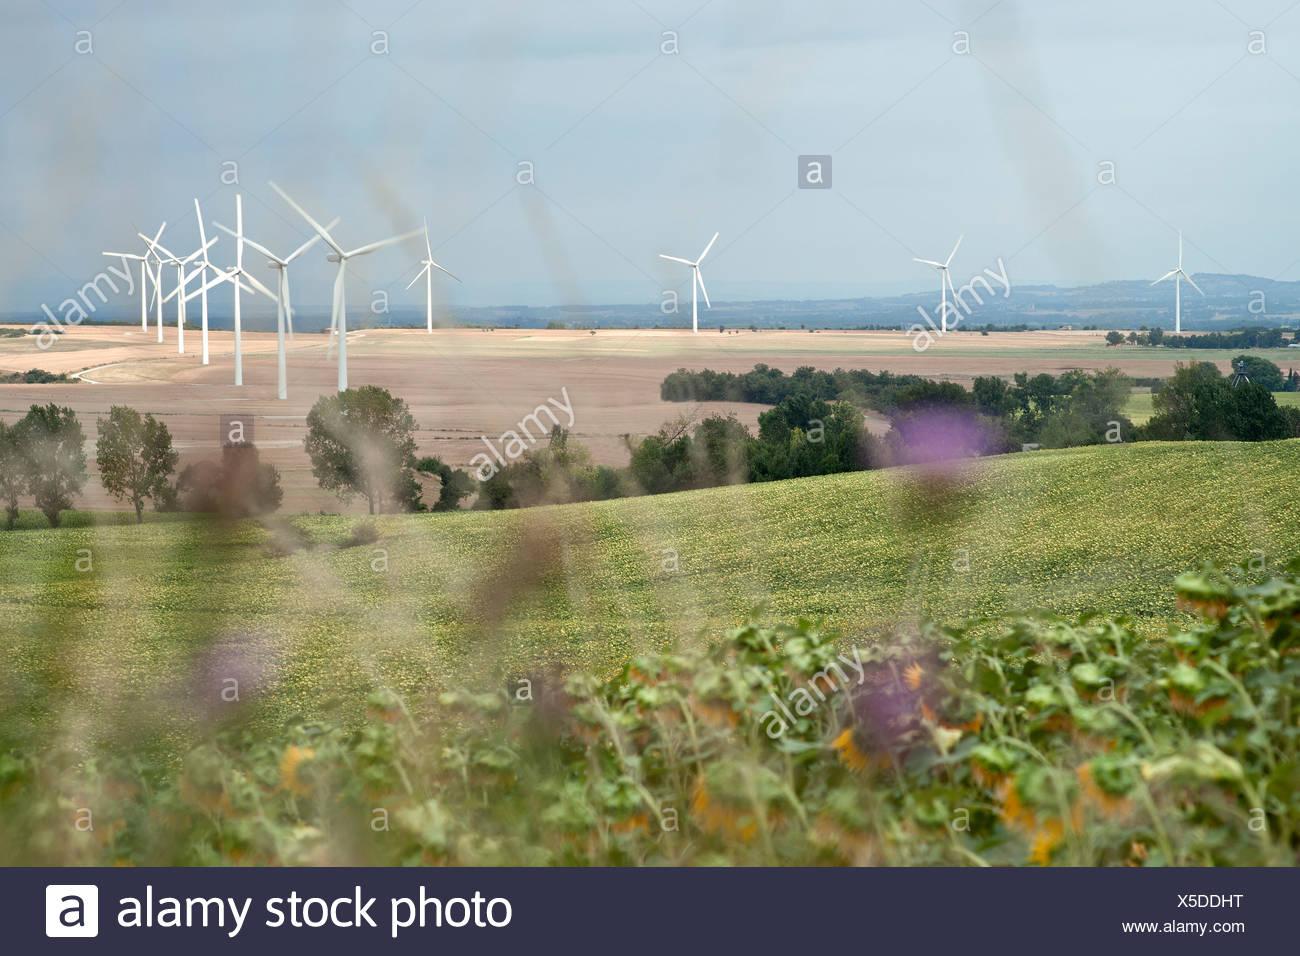 Wind farm landscape - Stock Image